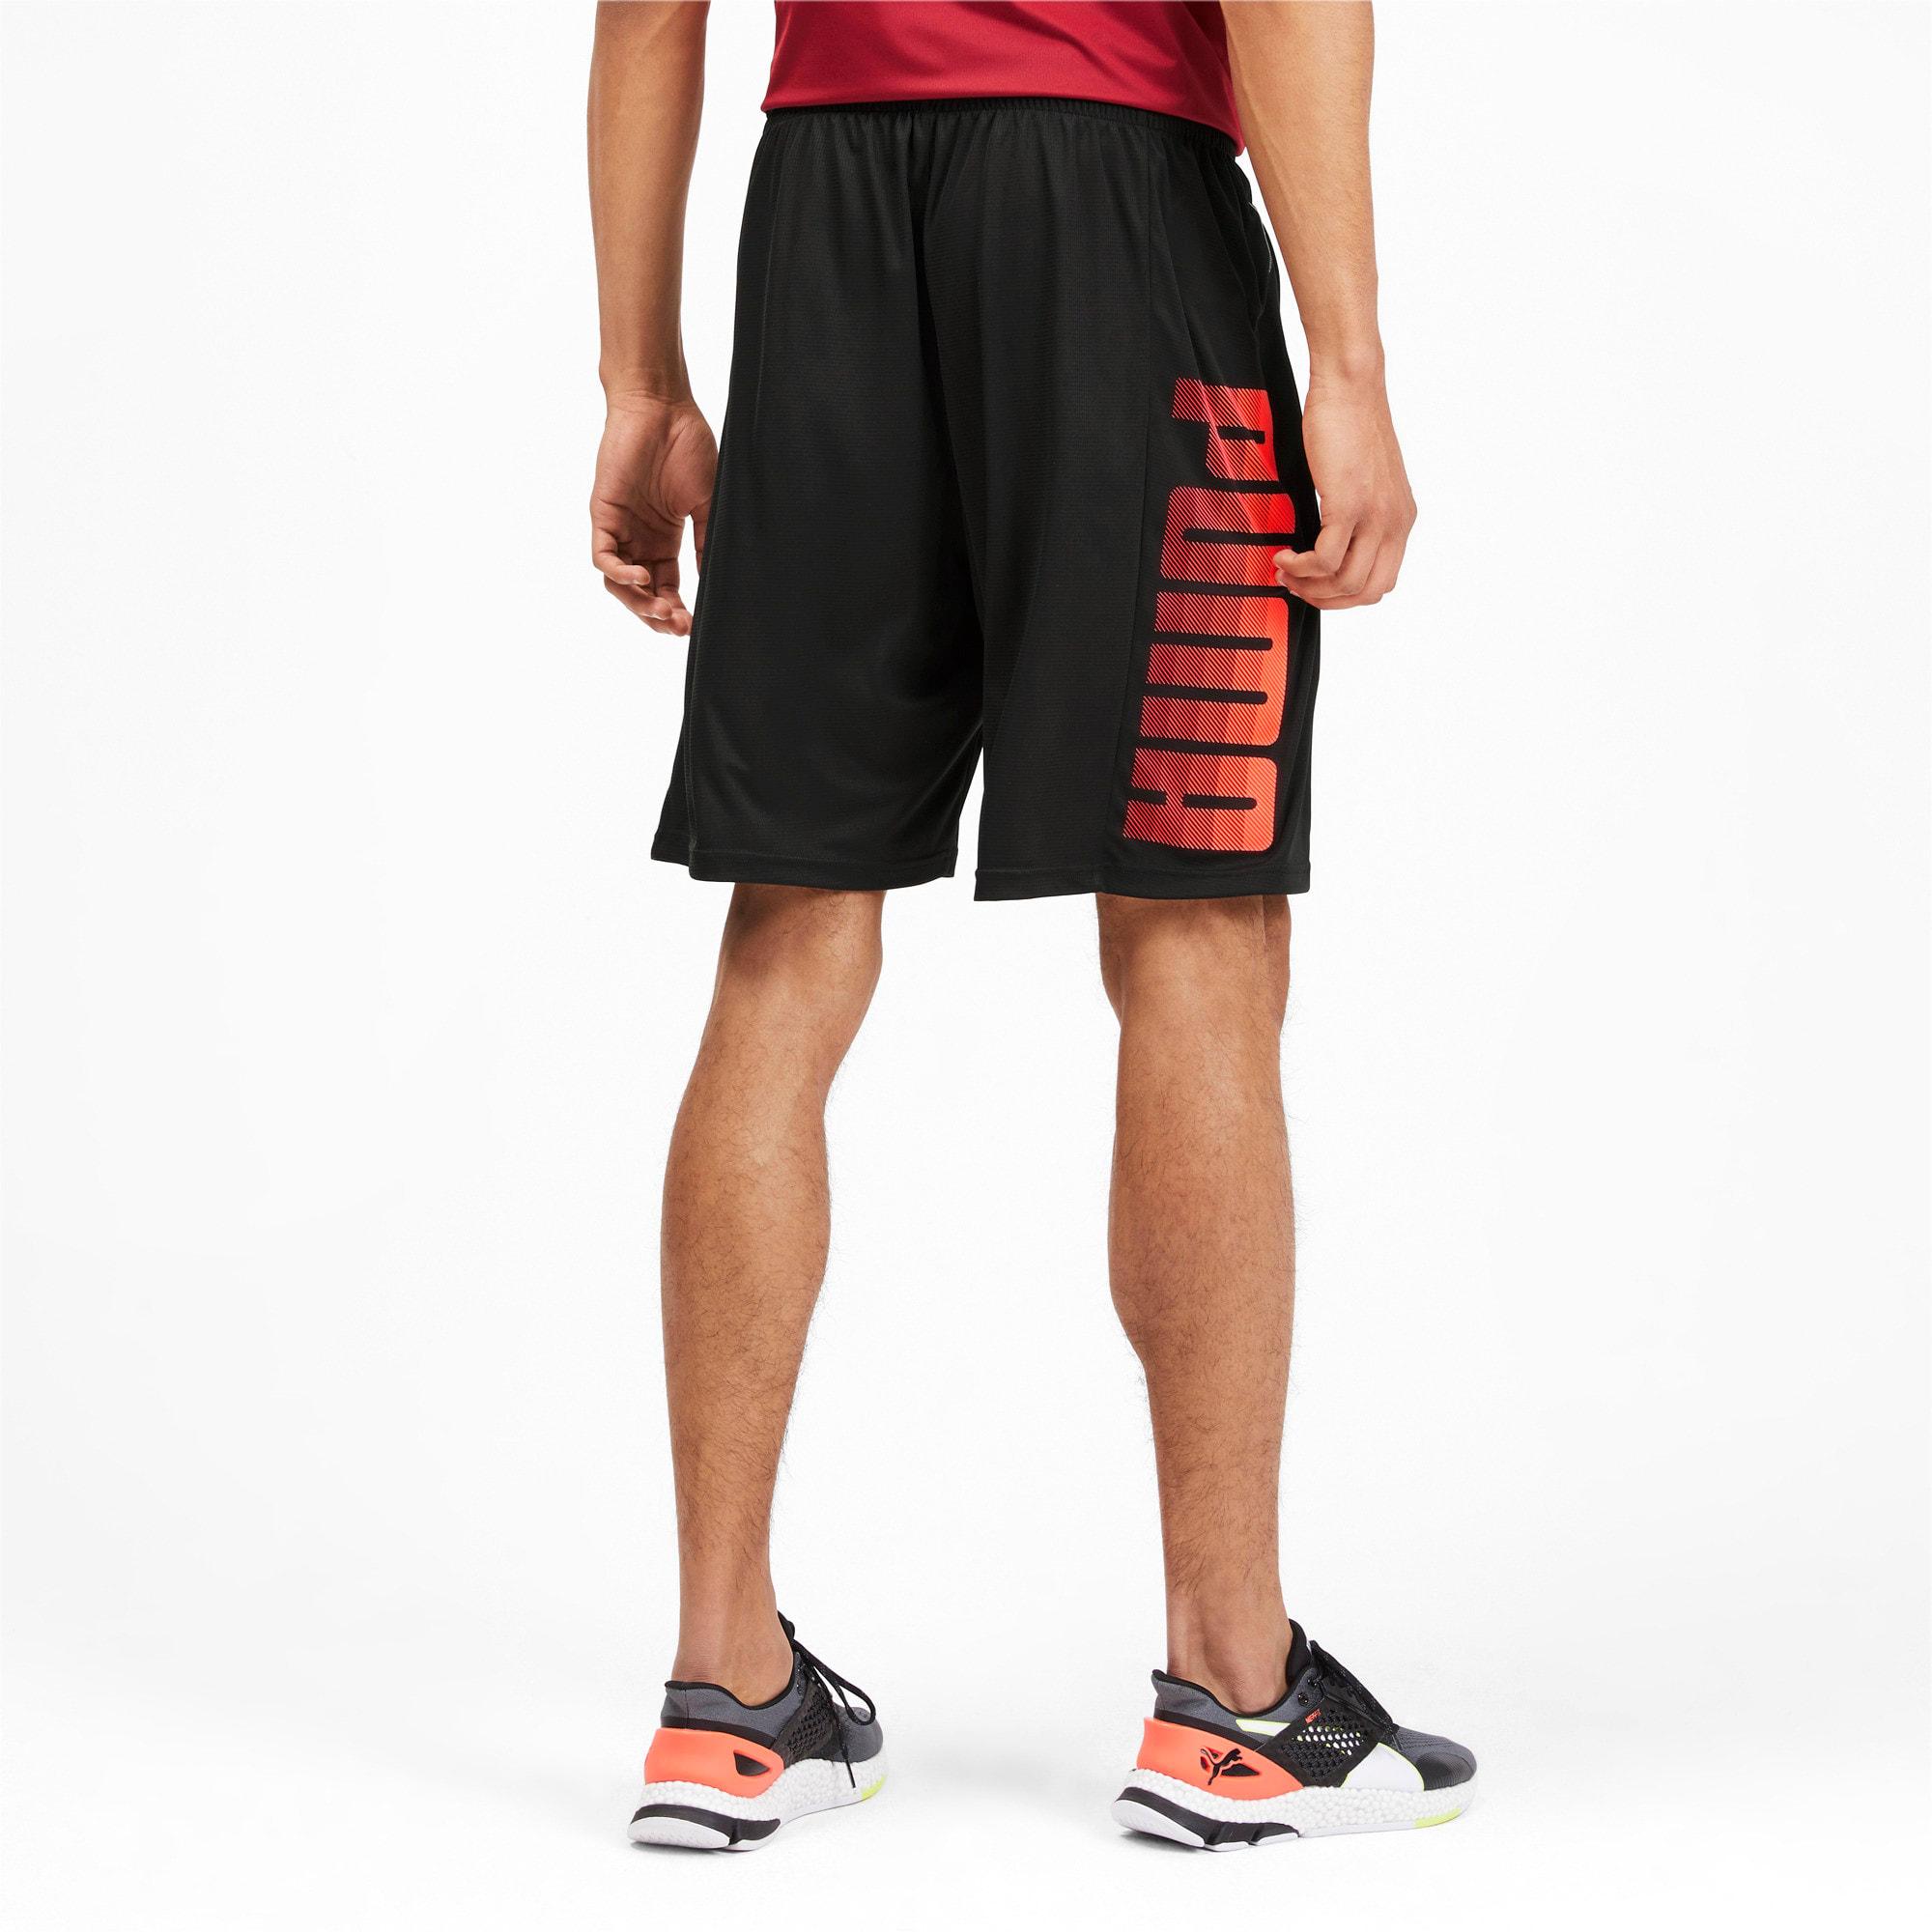 Miniatura 2 de Shorts de punto Collective para hombre, Puma Black-Nrgy Red, mediano